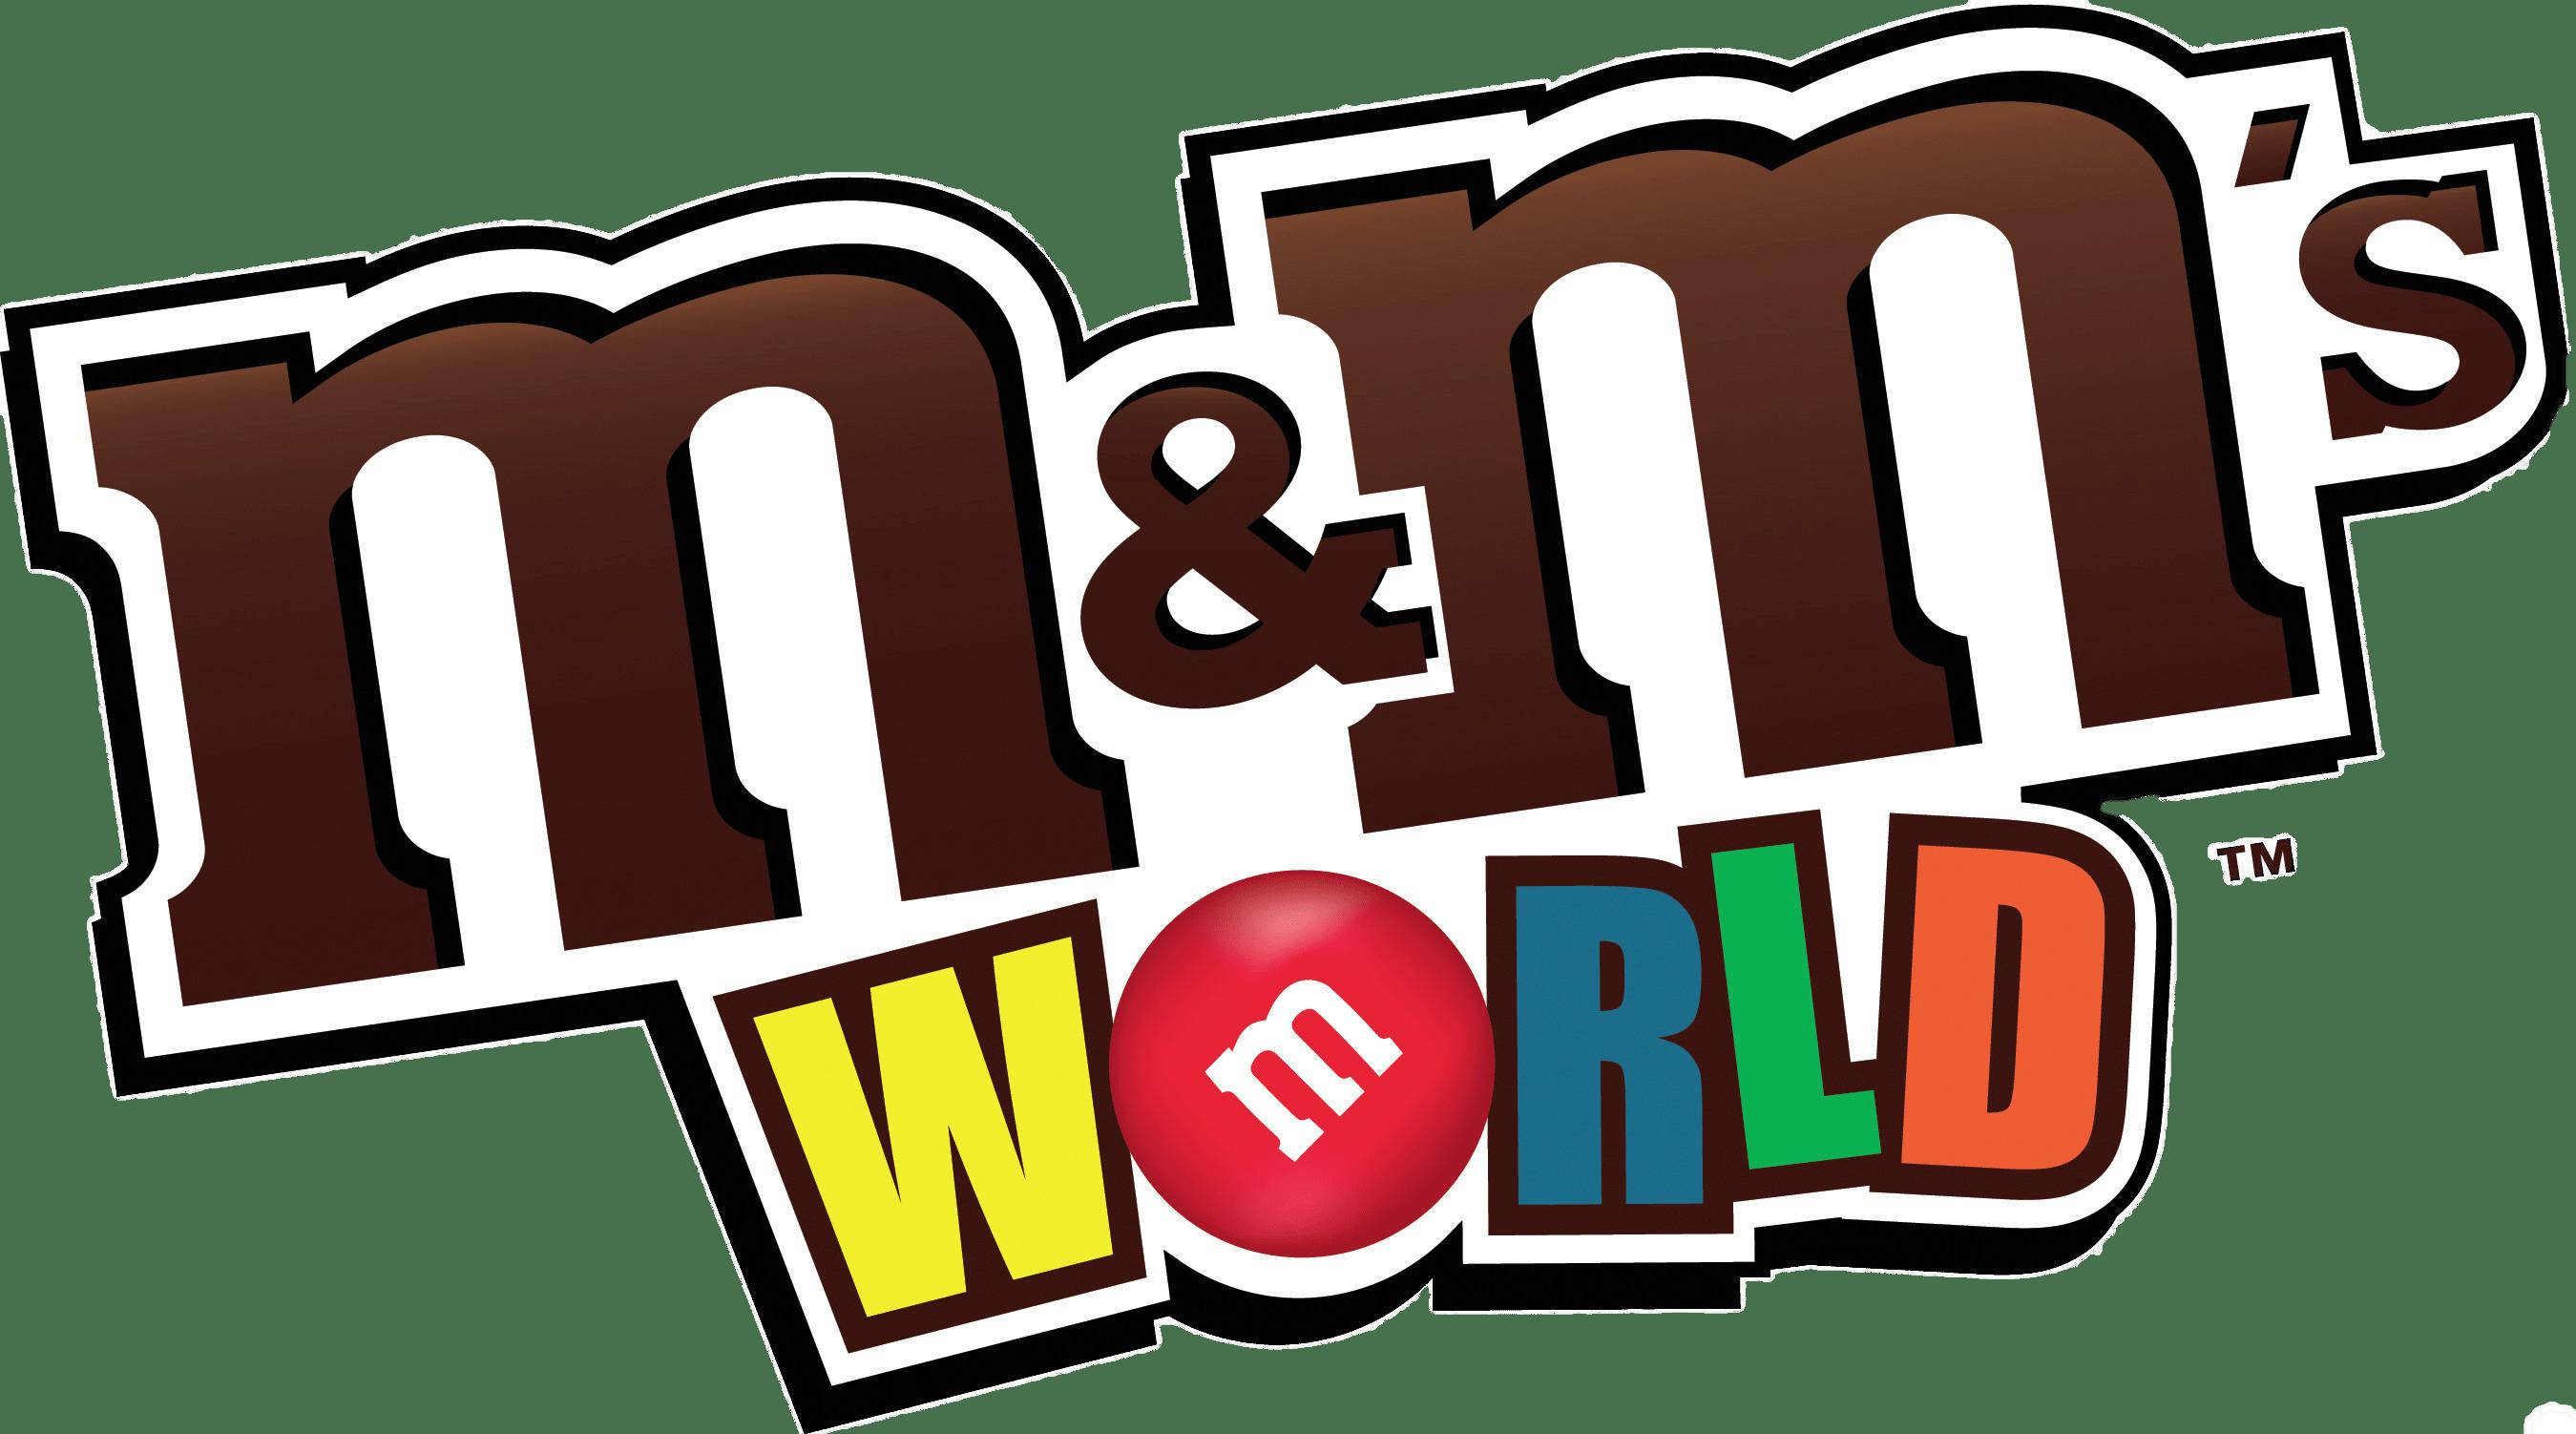 M&m's World Logo transparent PNG.